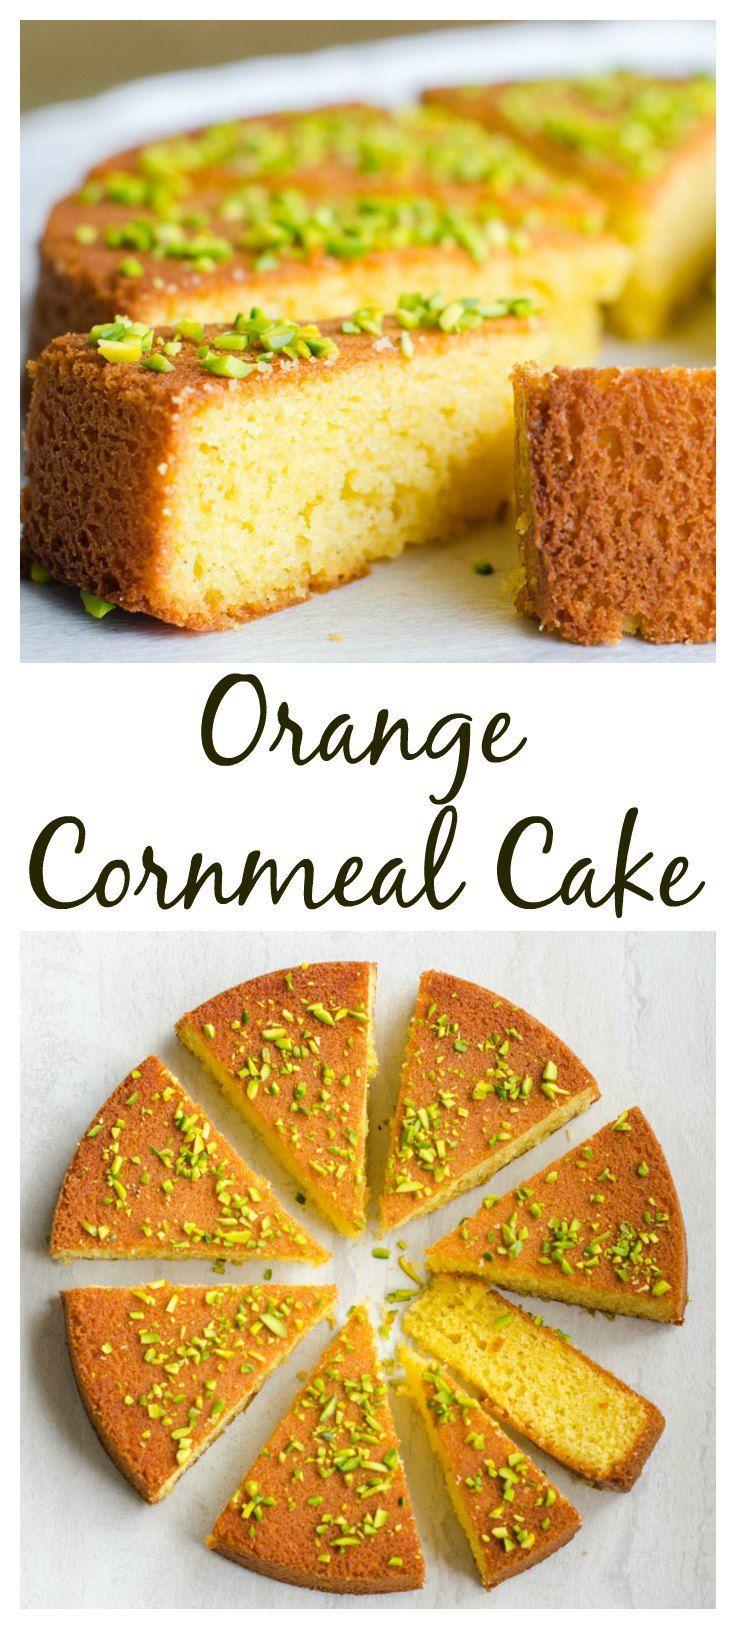 Orange Blossom Honey Glazed Cornmeal Cake